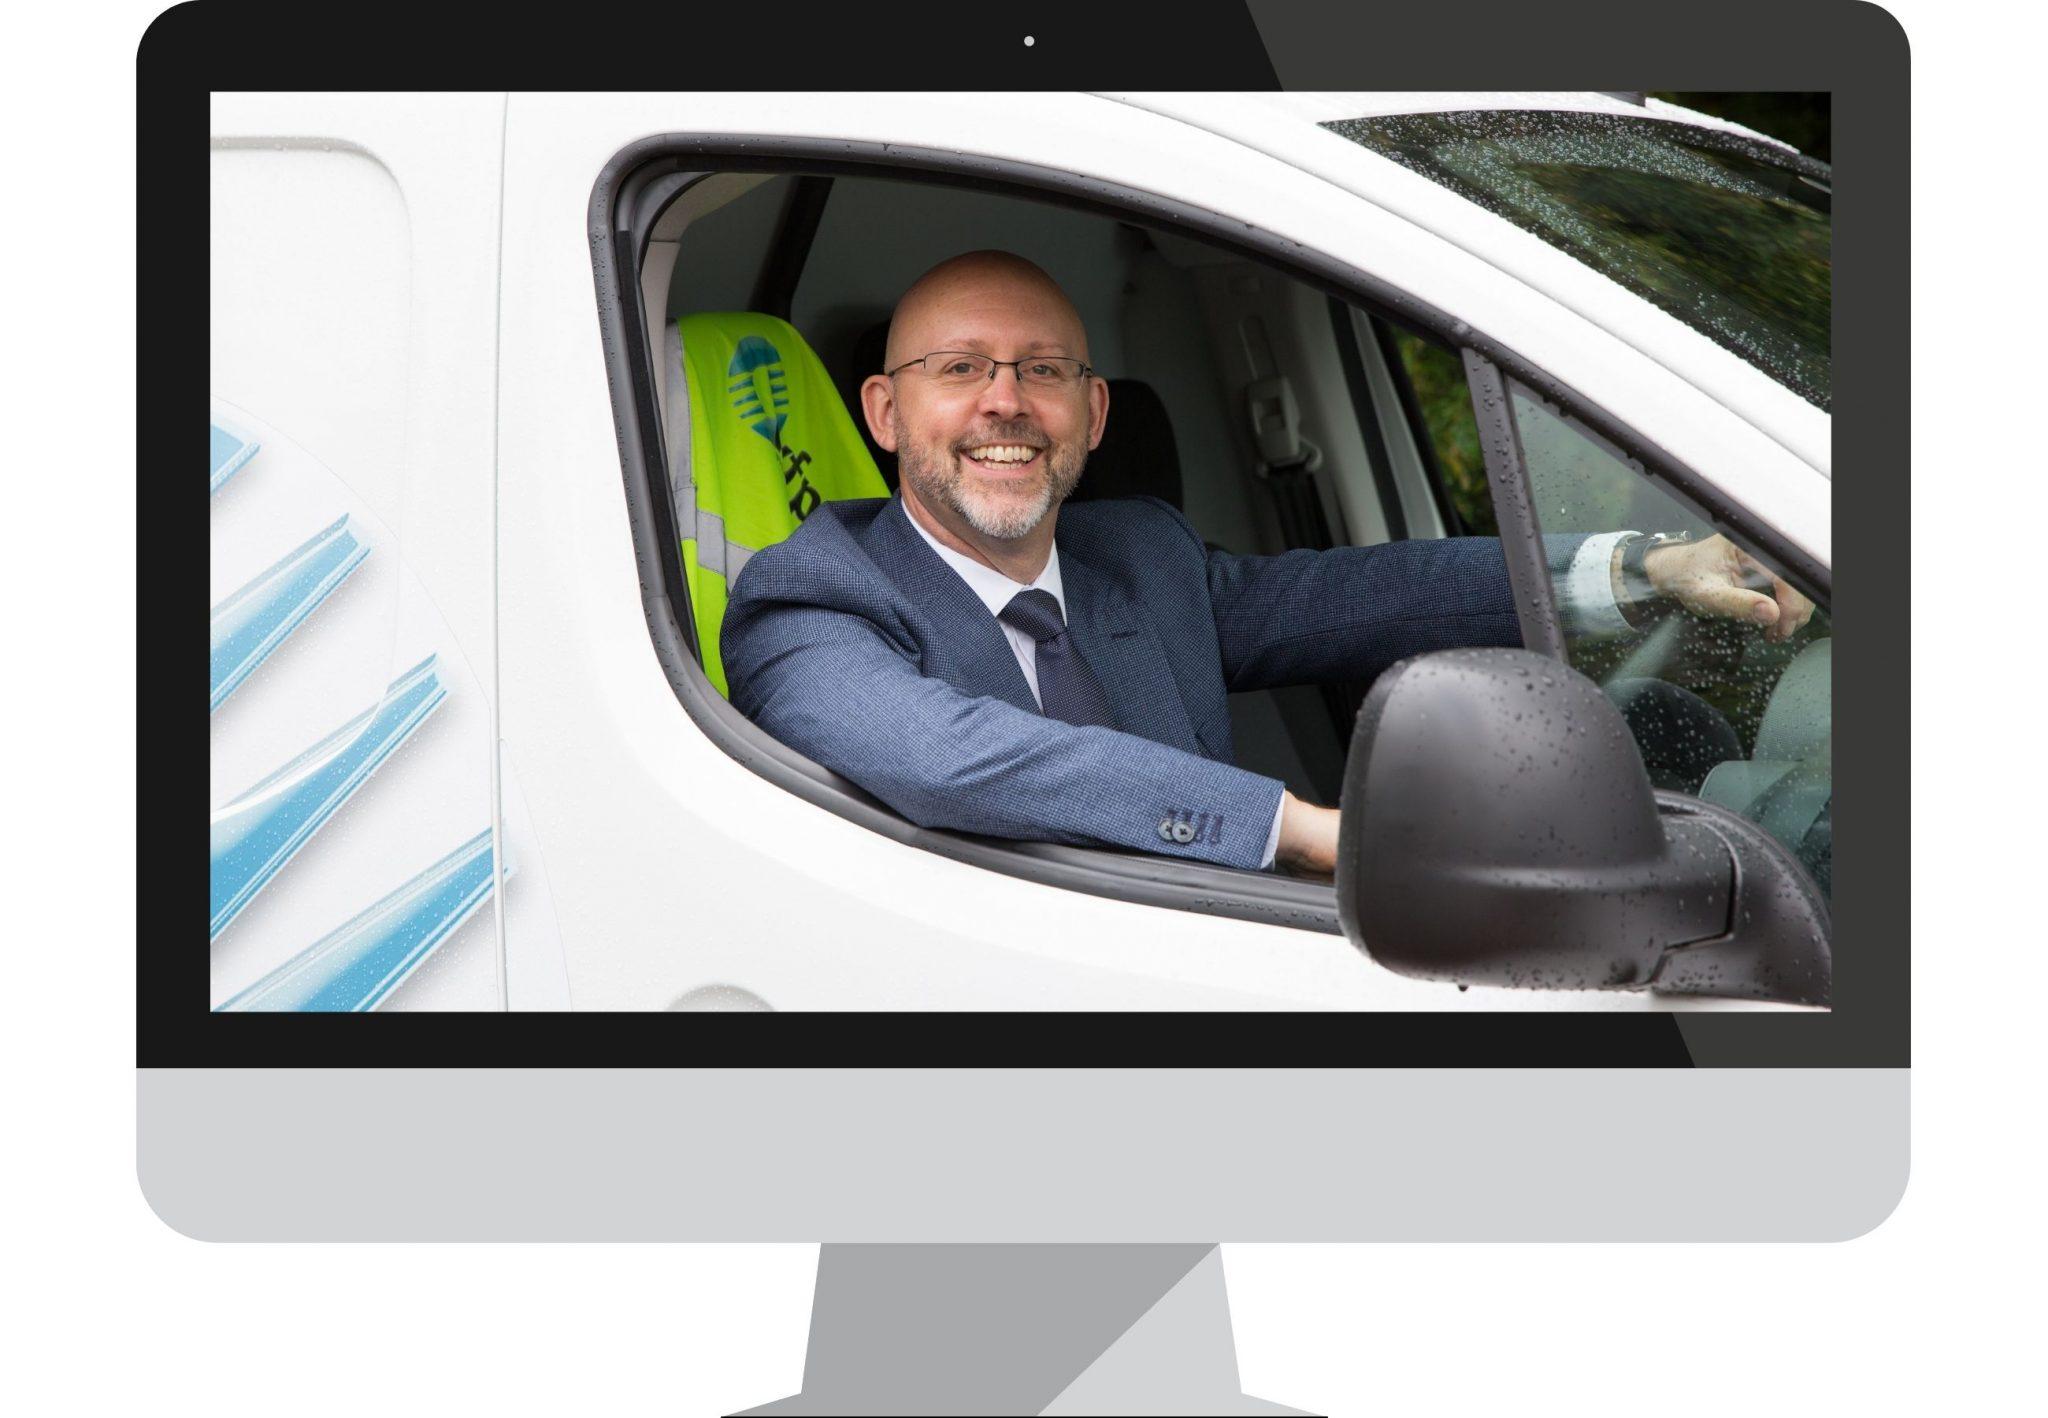 Paul Field, Founding Director, in a van